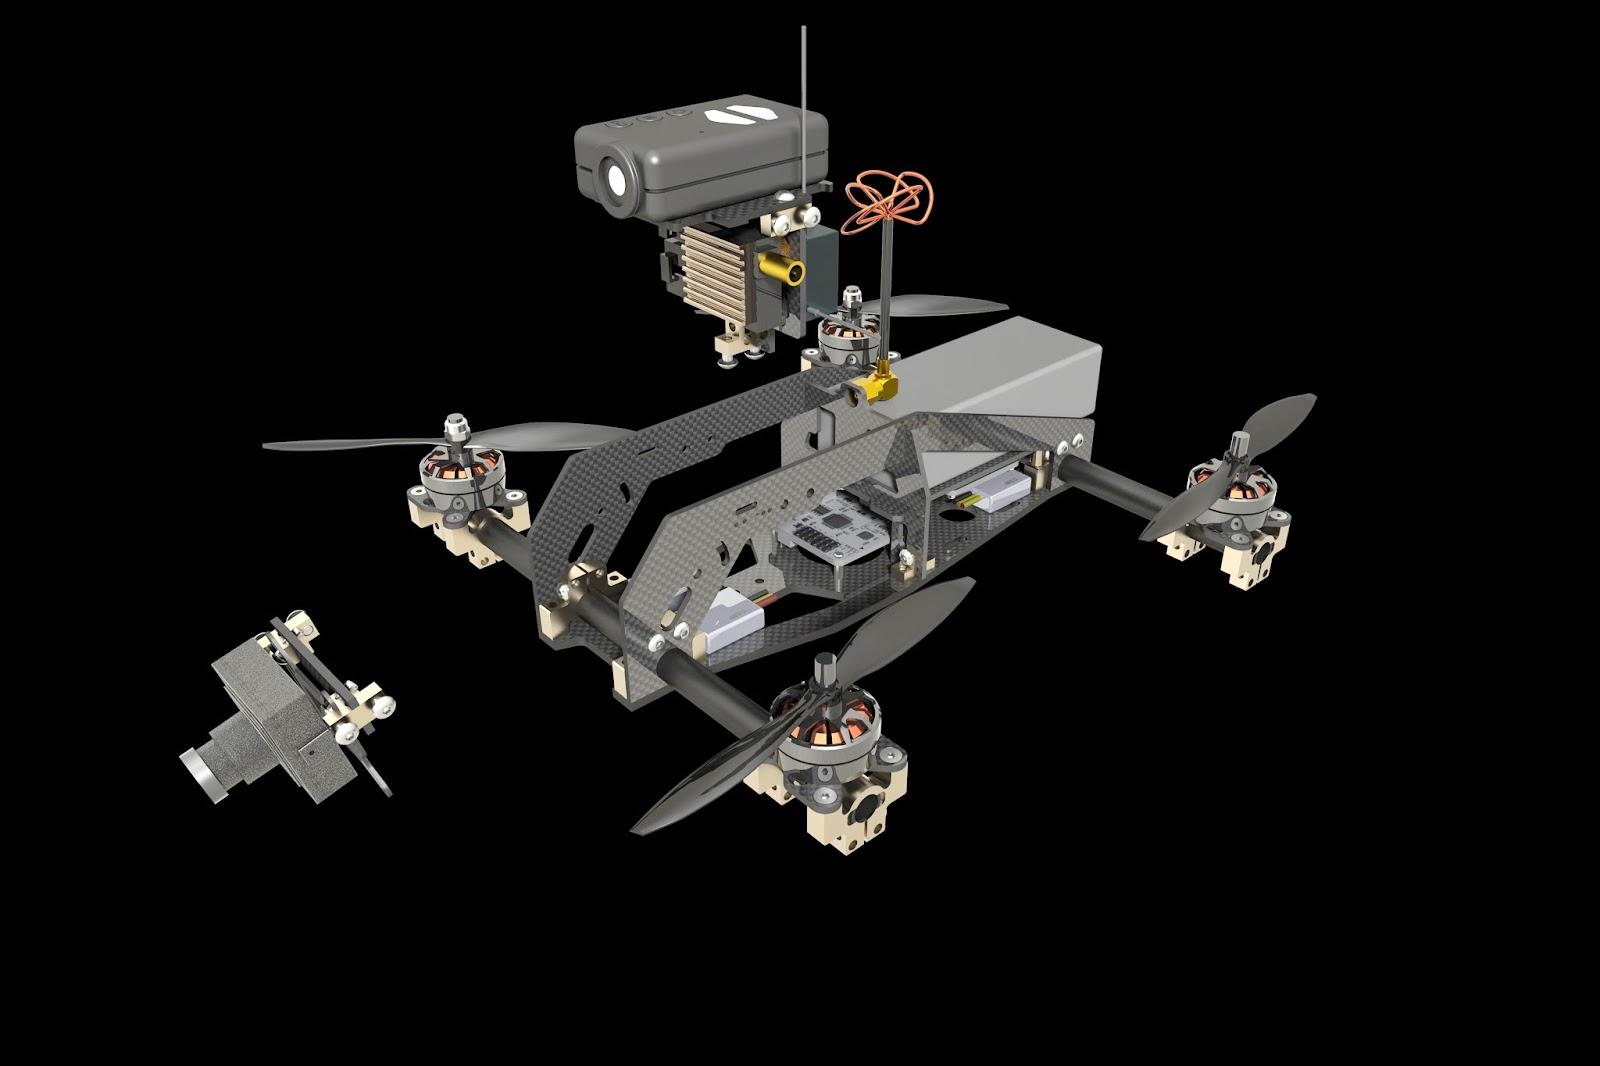 Quadcopter 250 Project - Hiperbock